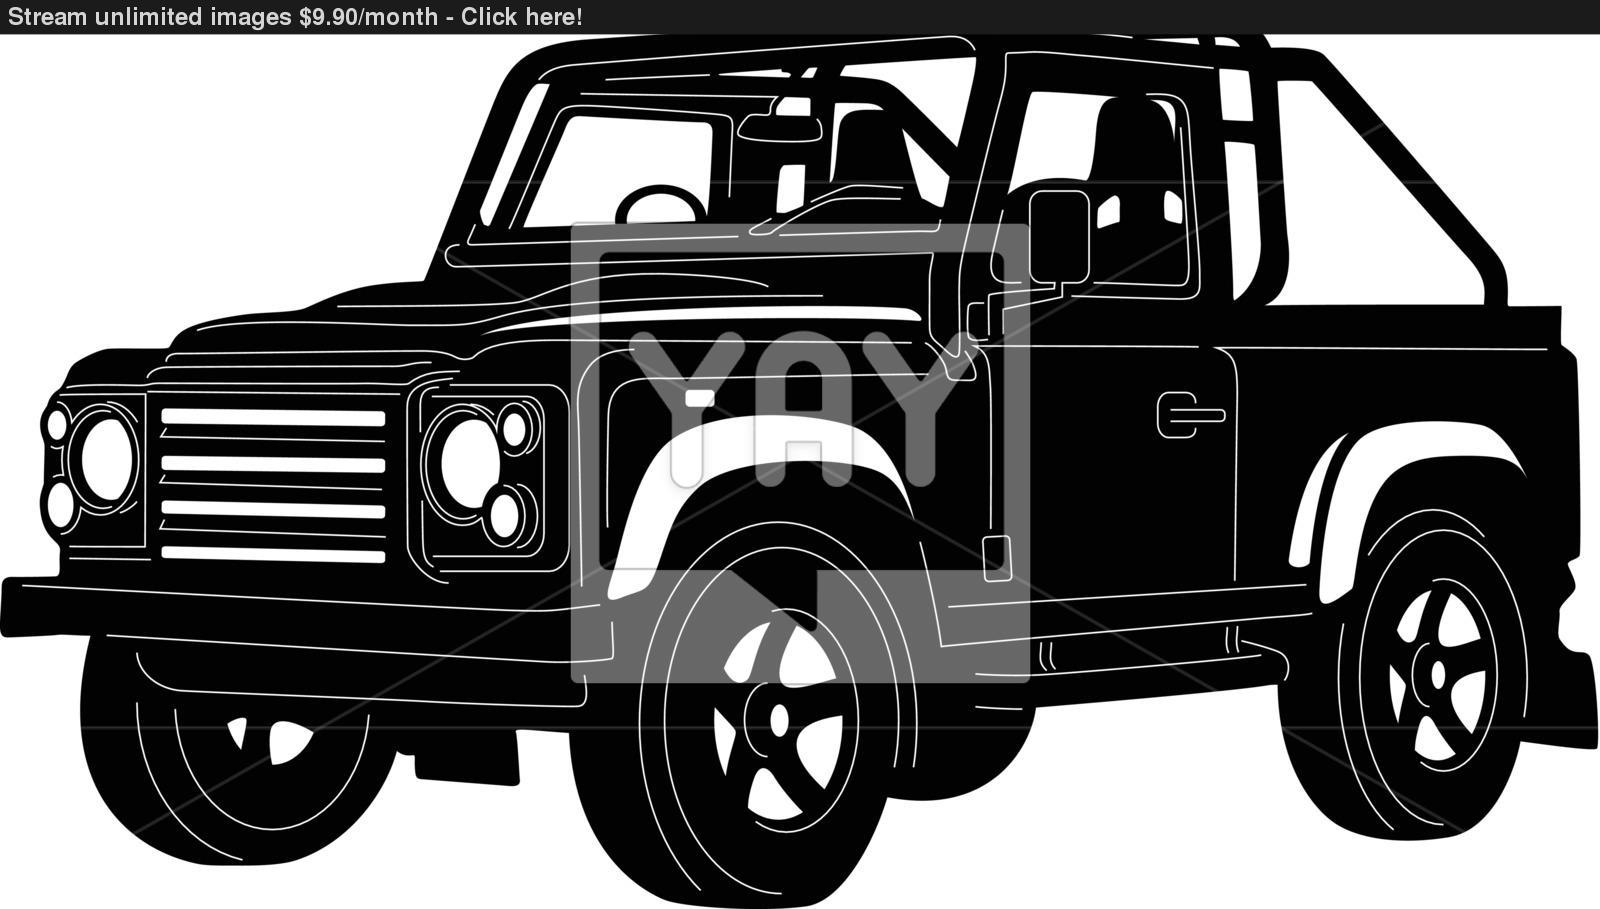 1600x909 4x4 Truck Silhouette Vector